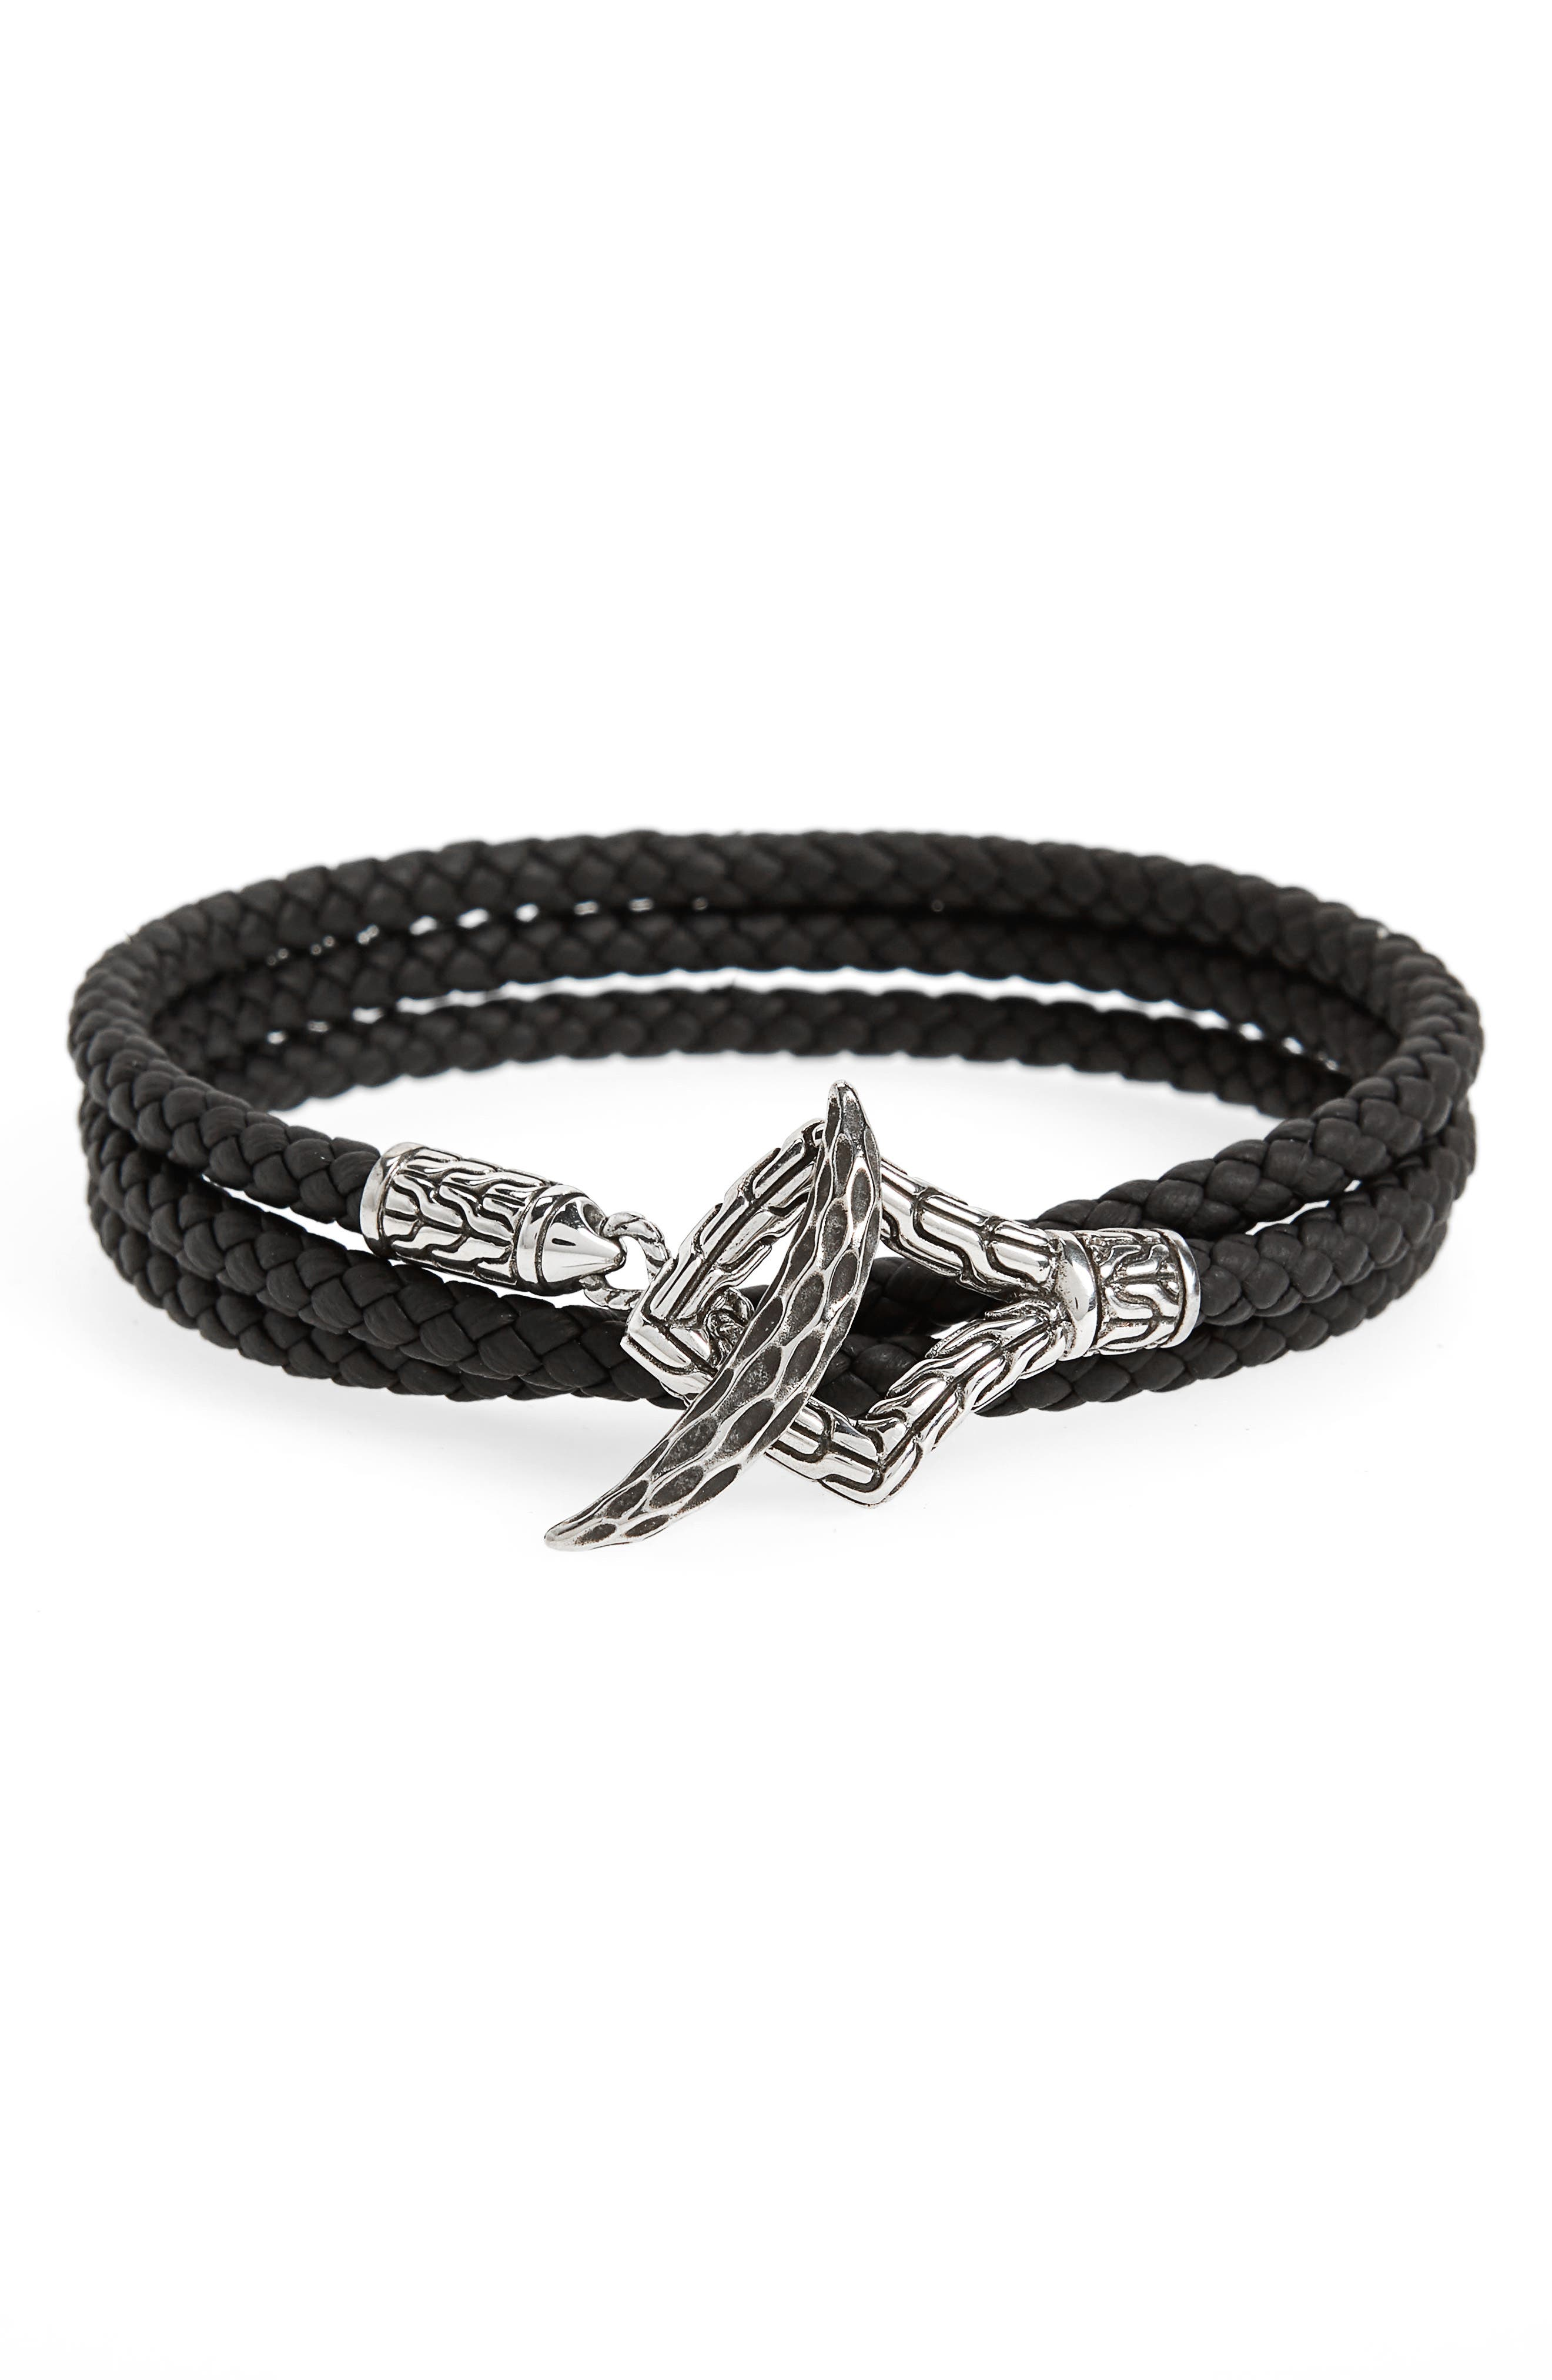 Legends Naga Triple Wrap Leather Bracelet,                         Main,                         color, Black/ Silver